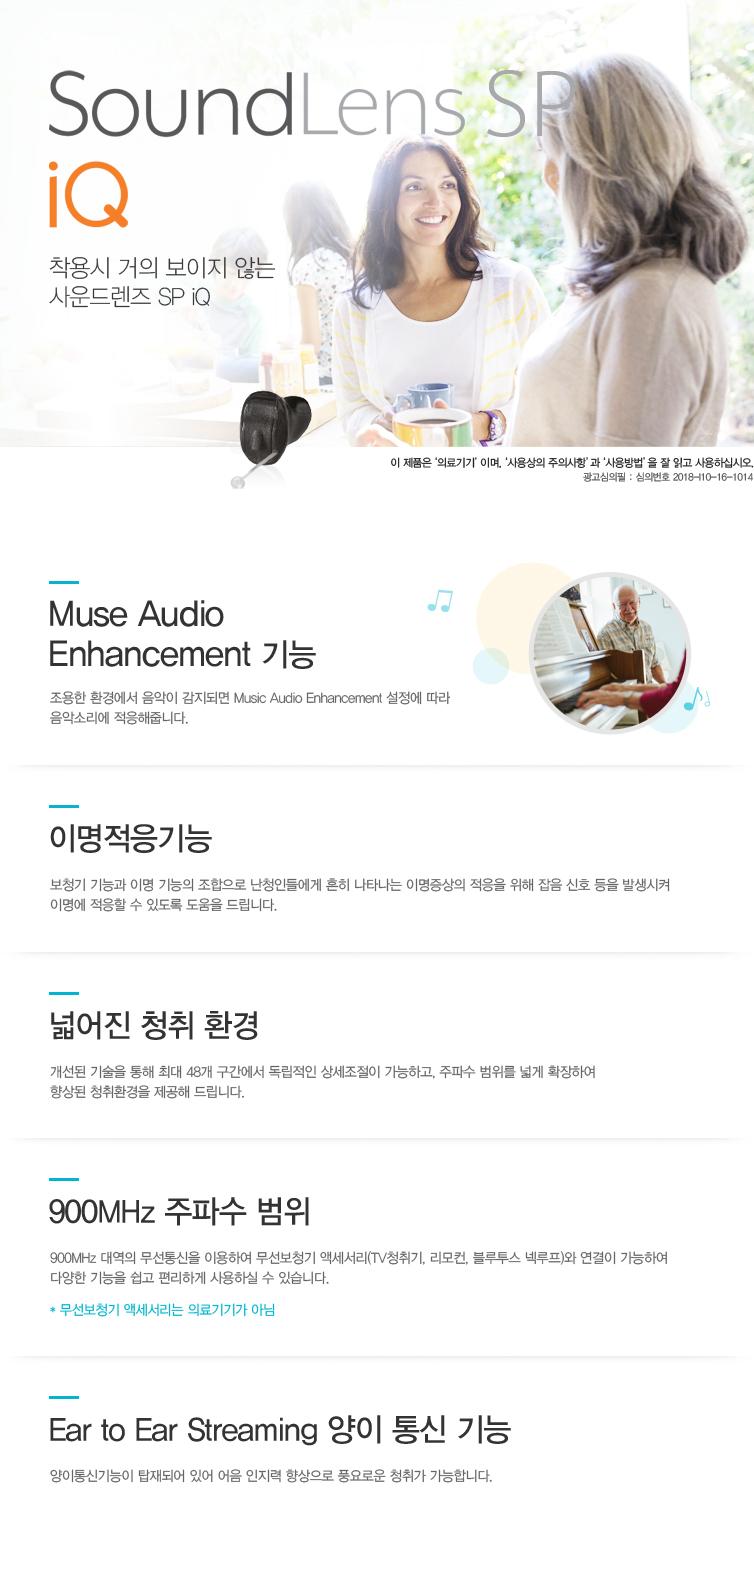 SoundLens SP iQ